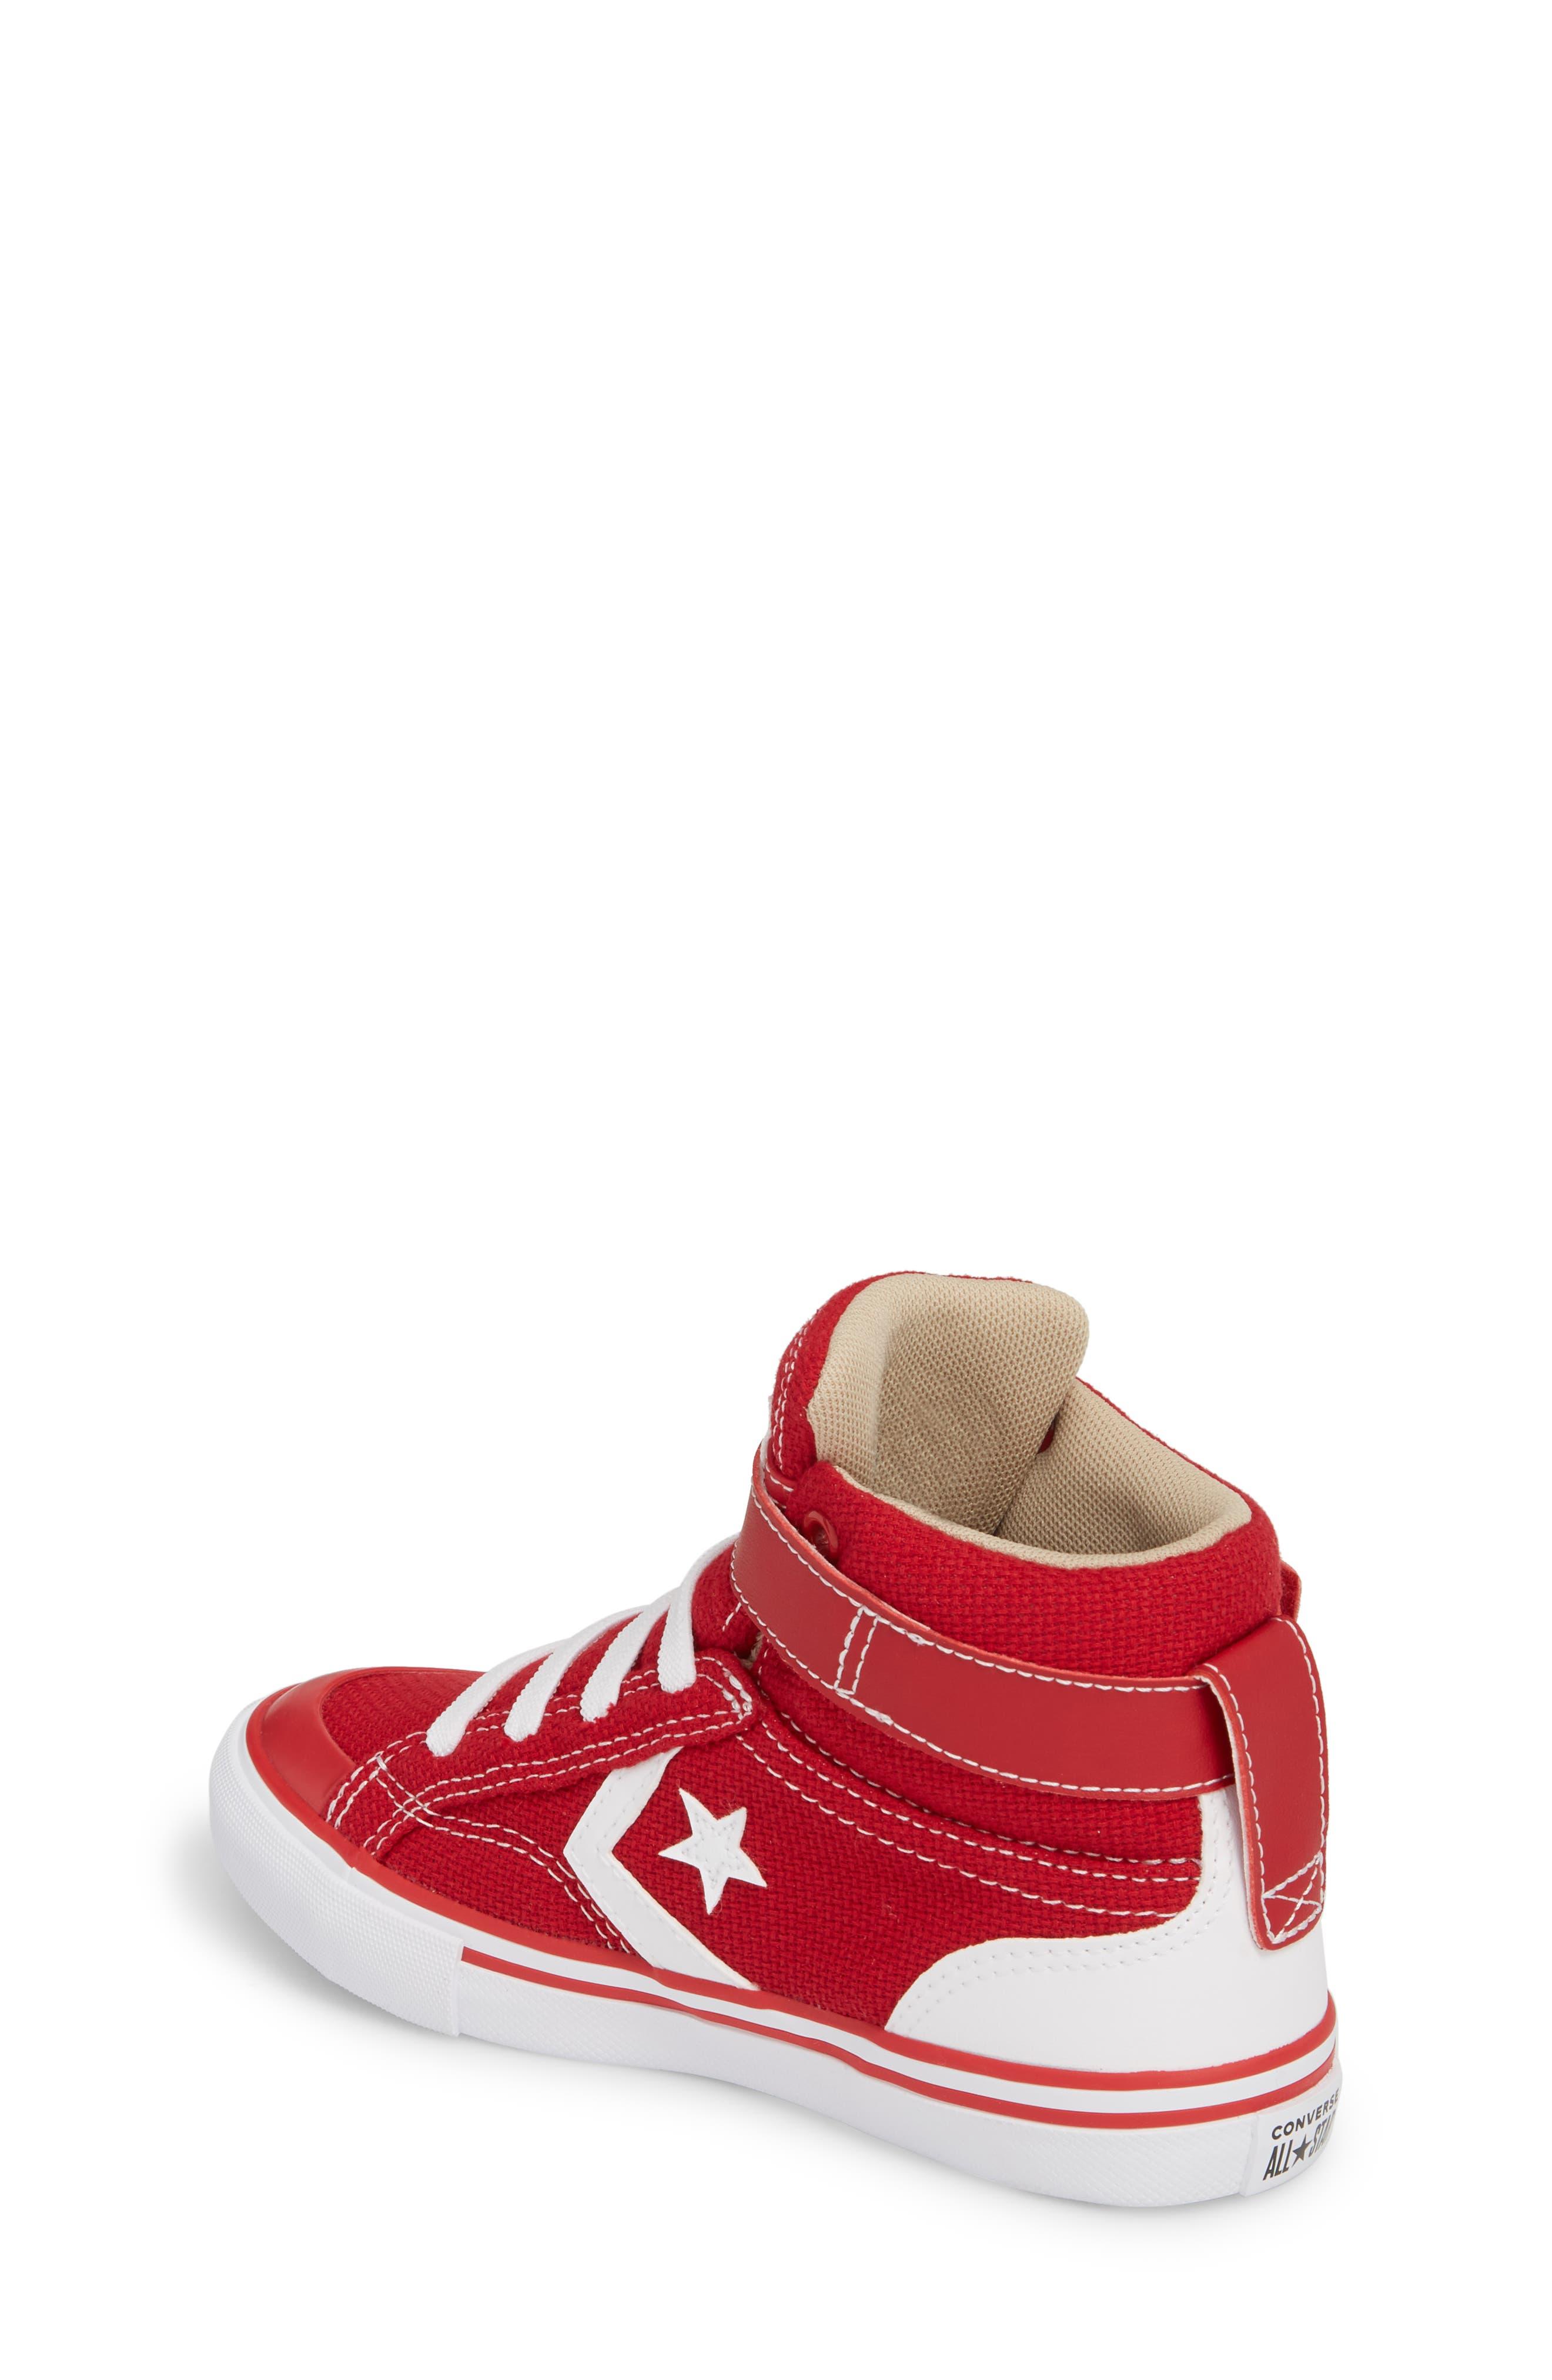 Pro Blaze High Top Sneaker,                             Alternate thumbnail 4, color,